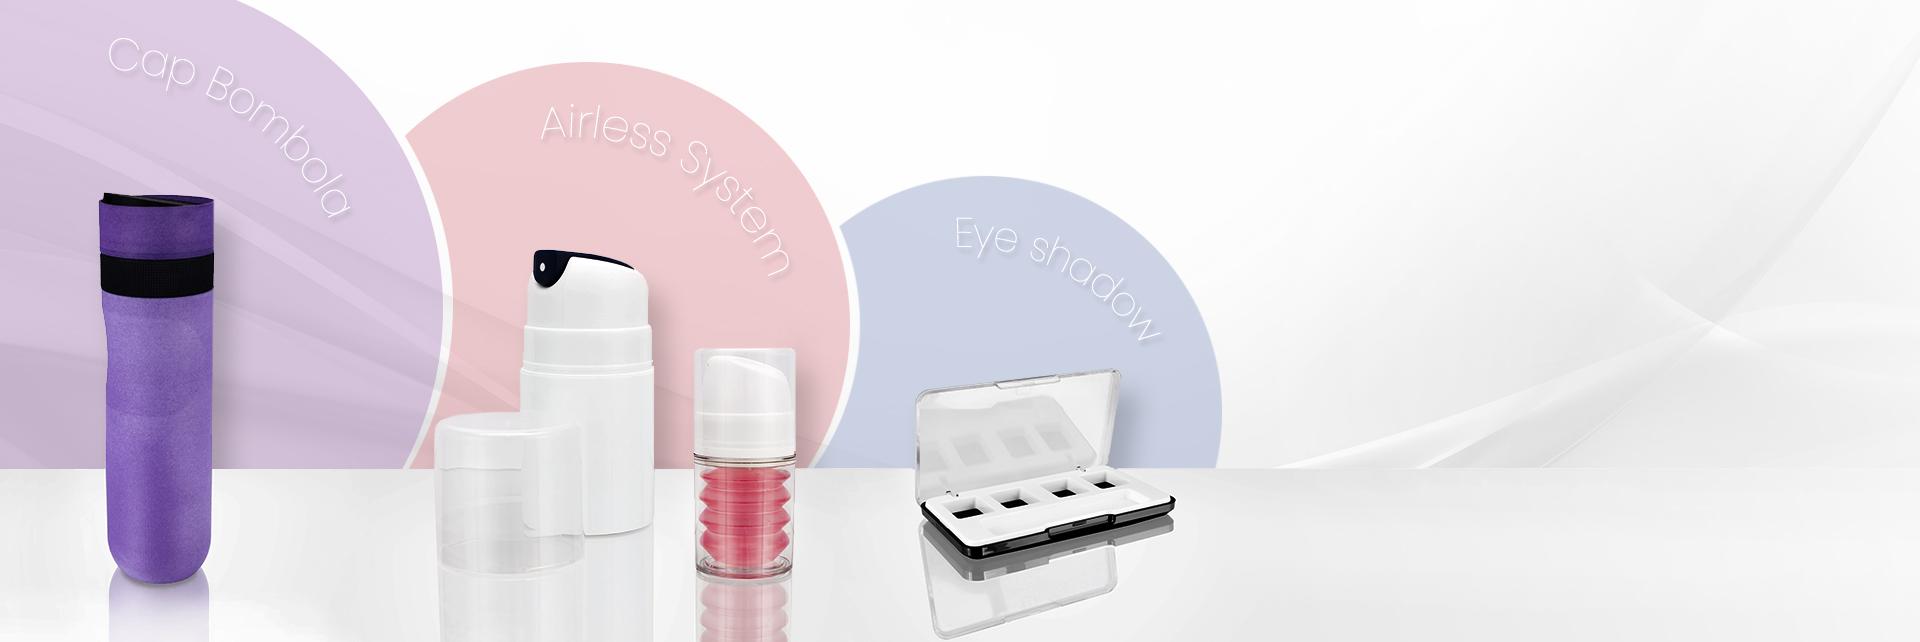 HK- Unique packaging based on a comprehensive product range